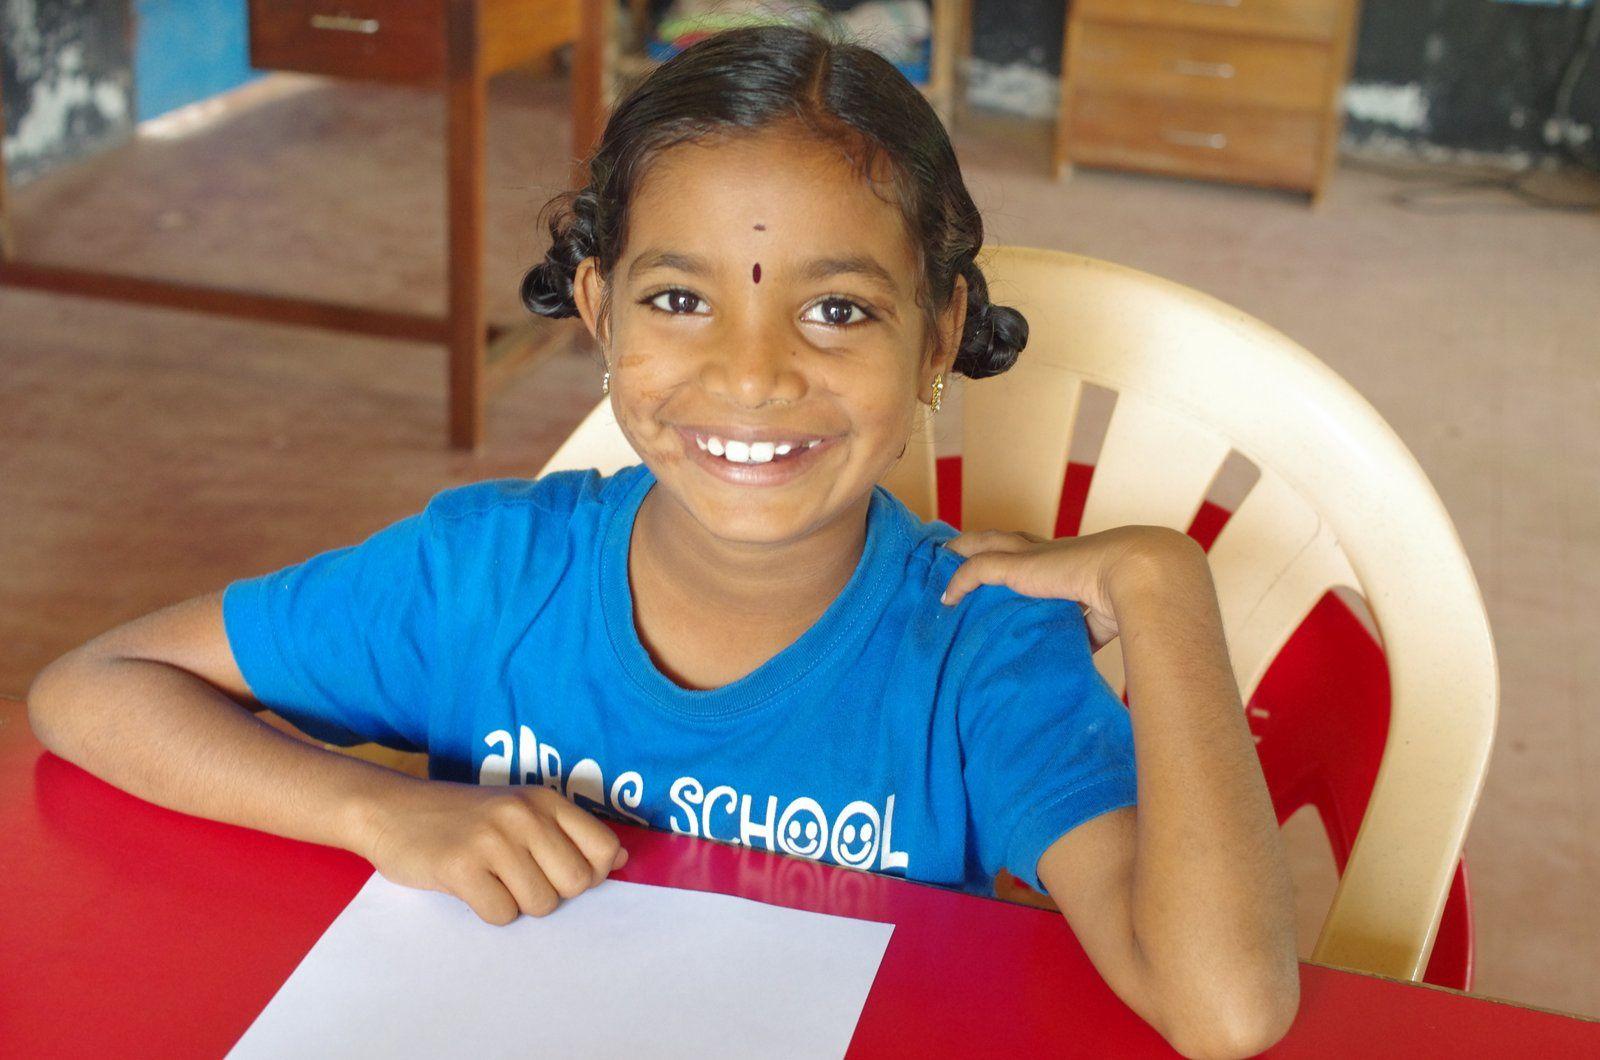 Devayani apres school pondichery tamil nadu inde